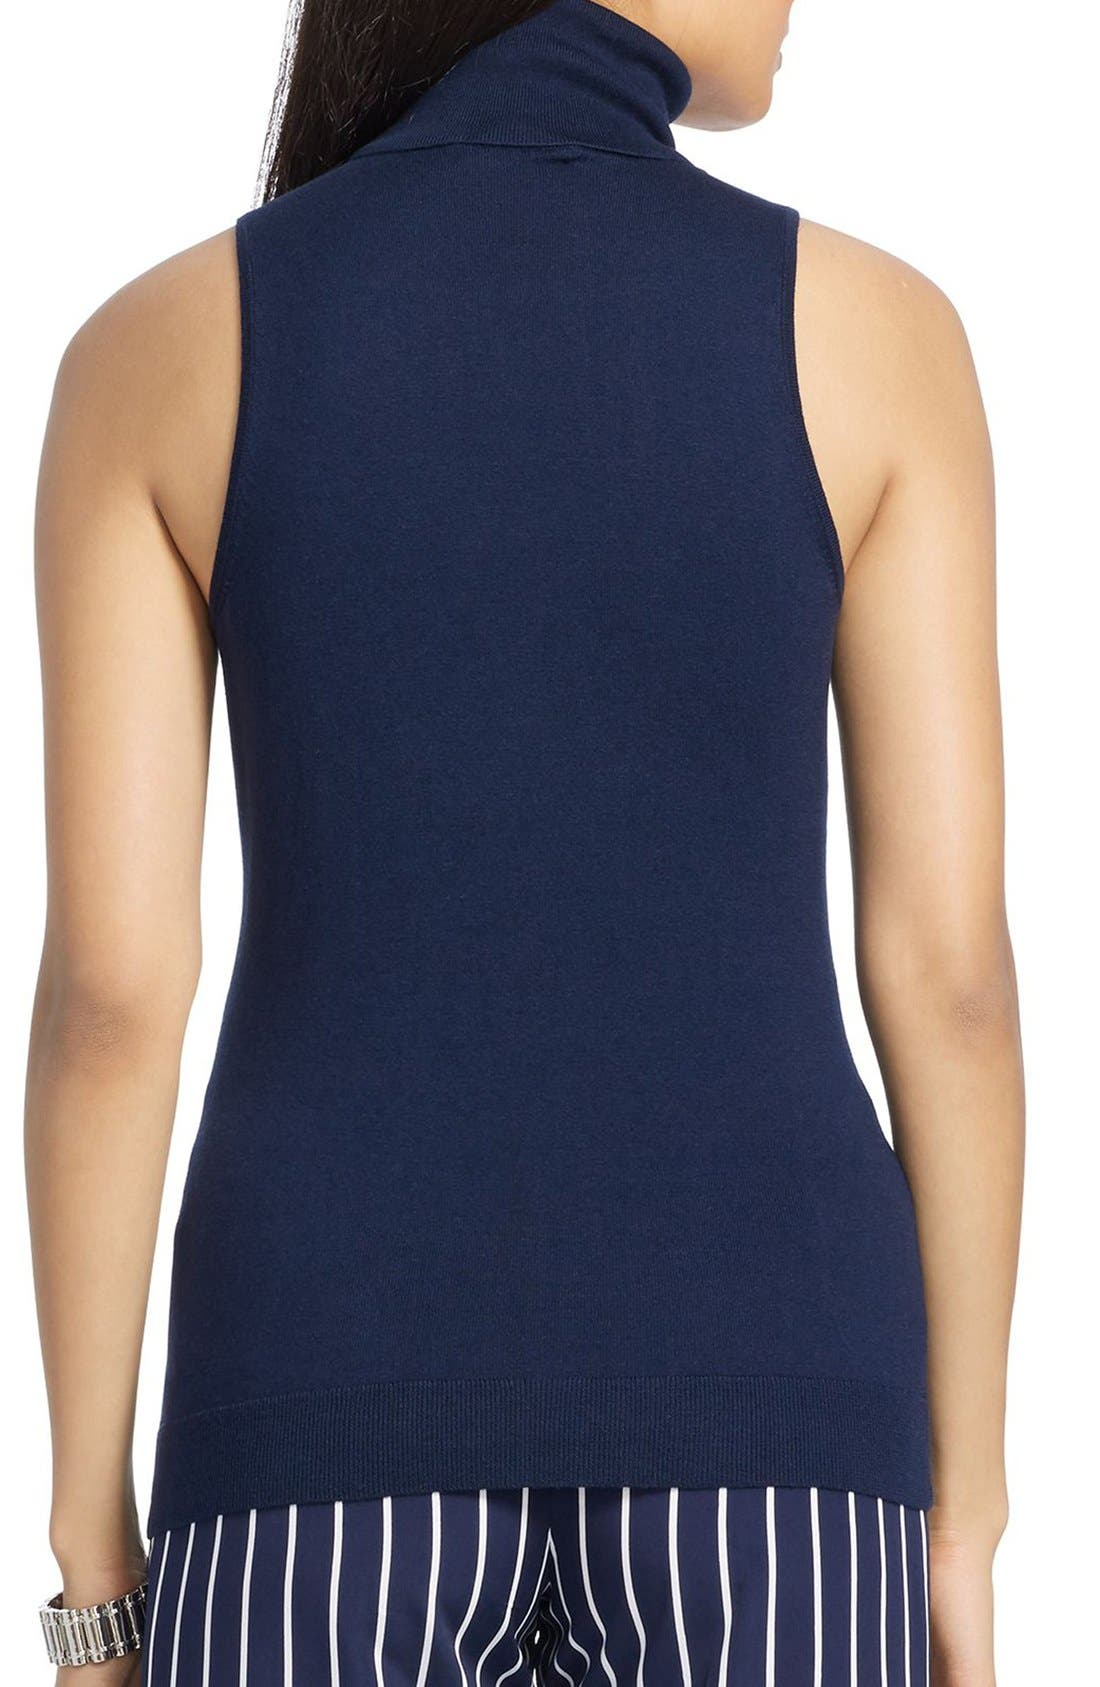 Alternate Image 2  - Lauren Ralph Lauren Silk Blend Sleeveless Turtleneck Sweater